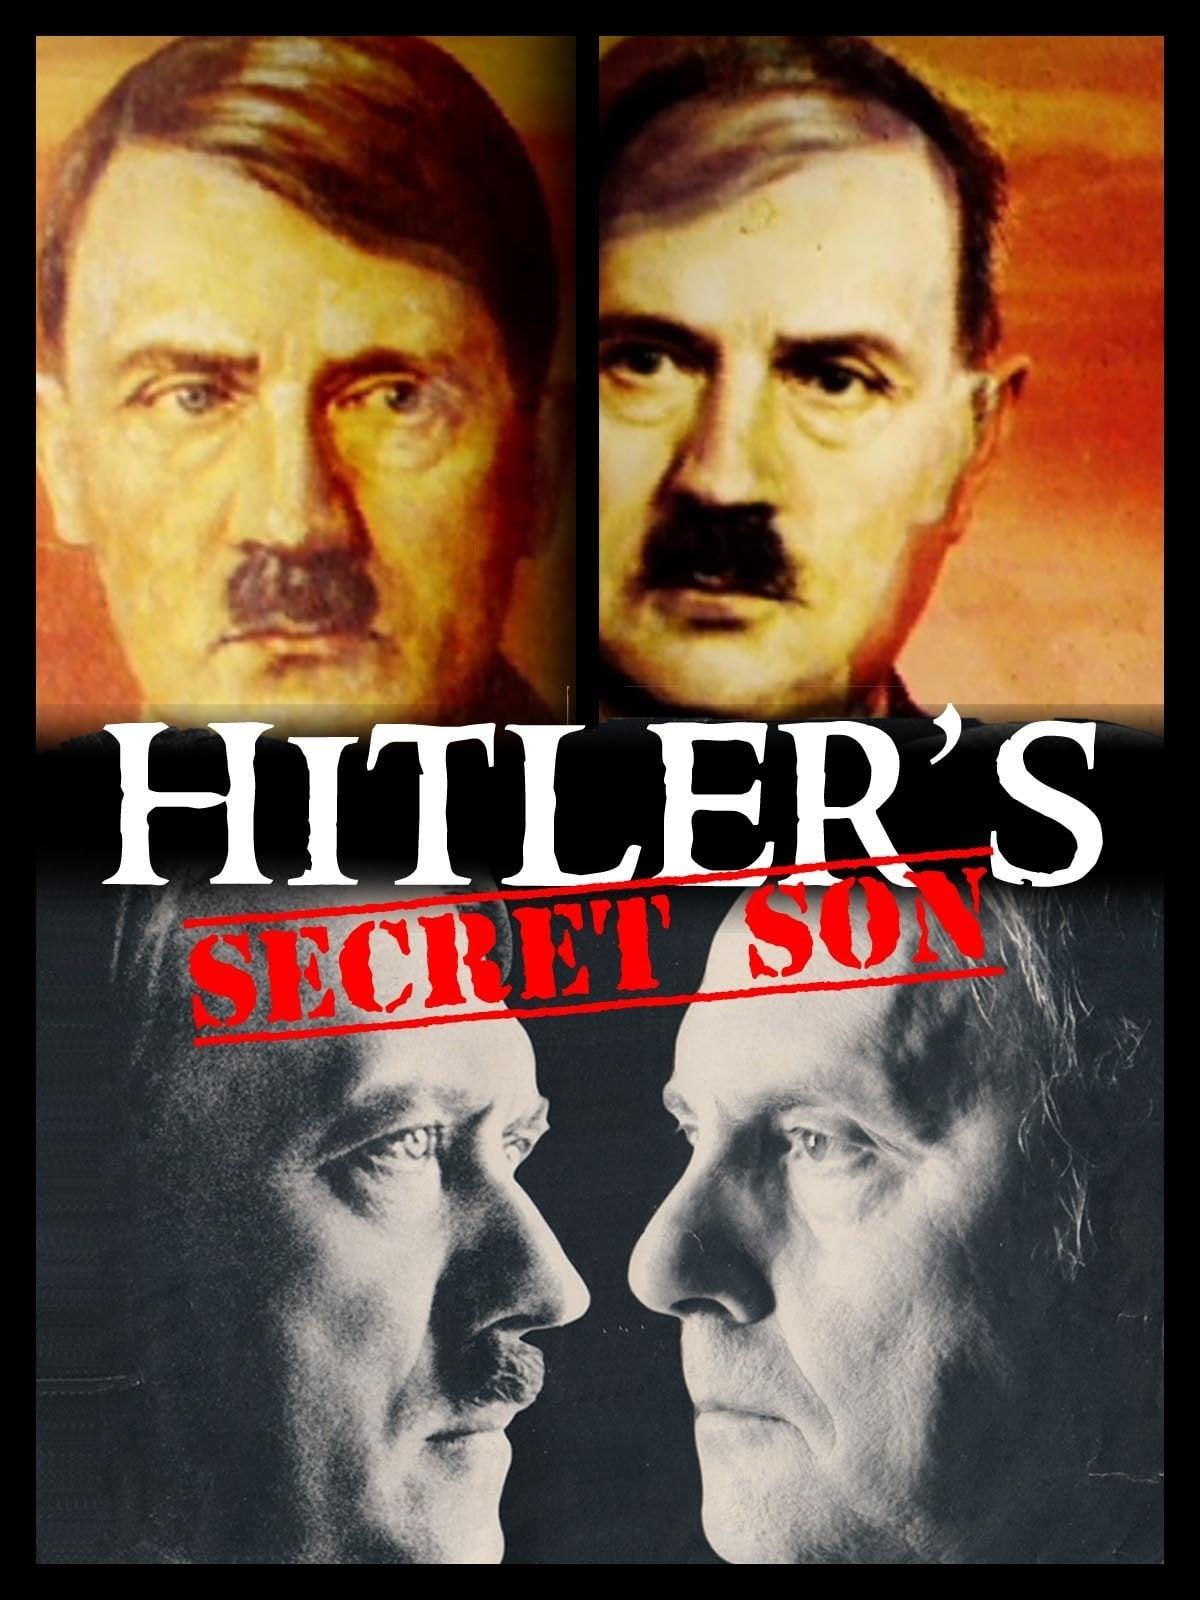 Hitler's Secret Son on FREECABLE TV